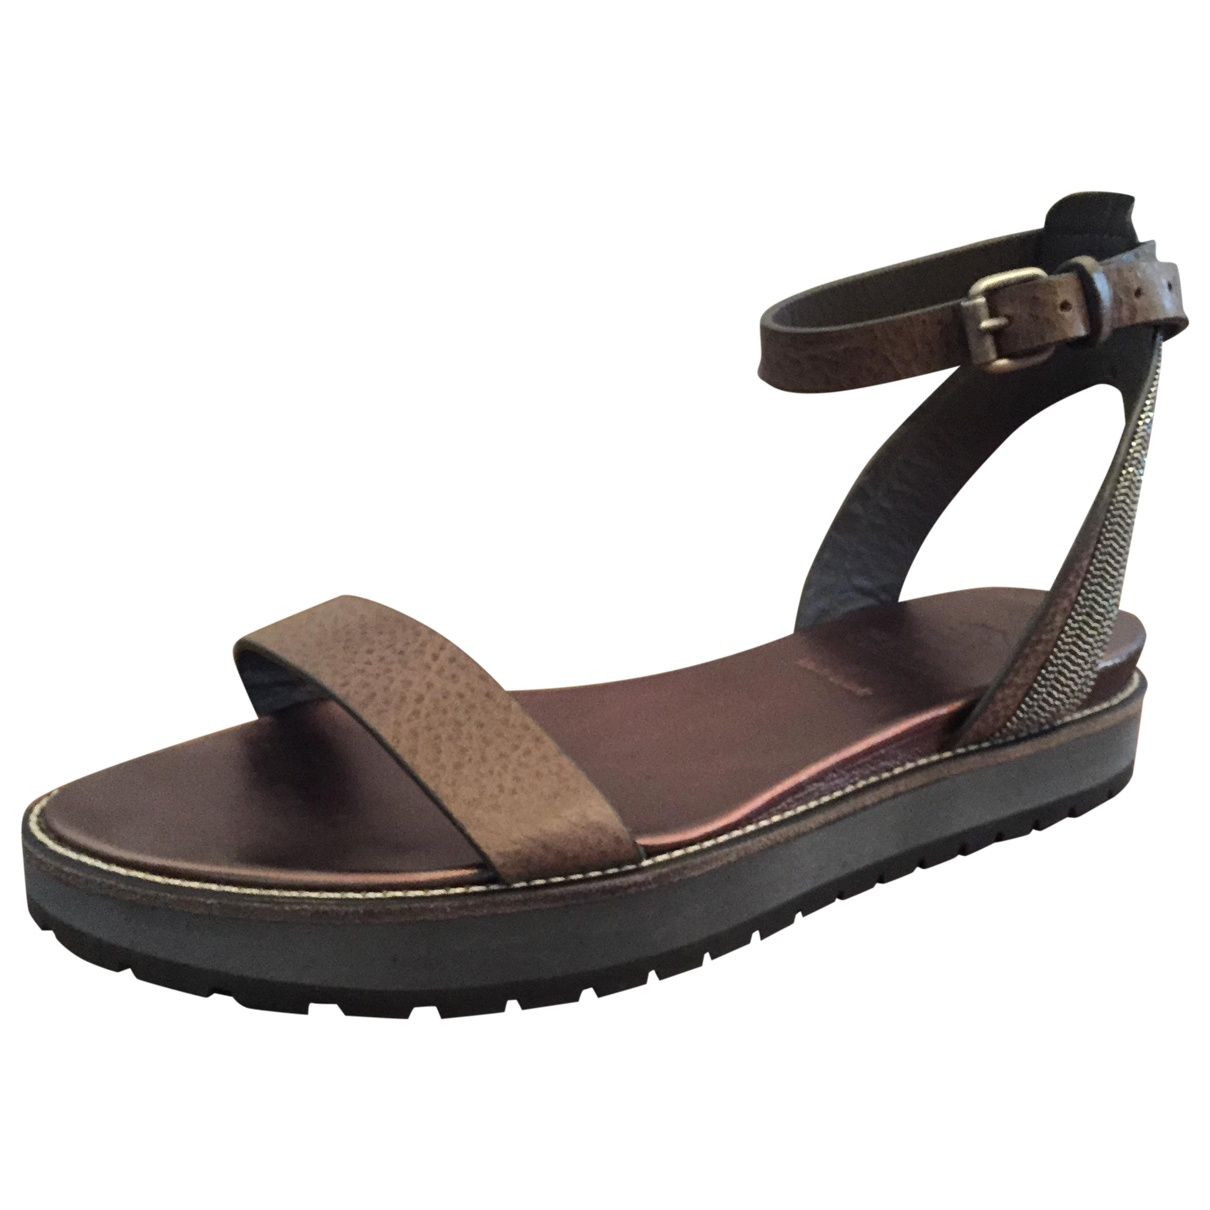 Brunello Cucinelli \N Brown Leather Sandals for Women 36 EU